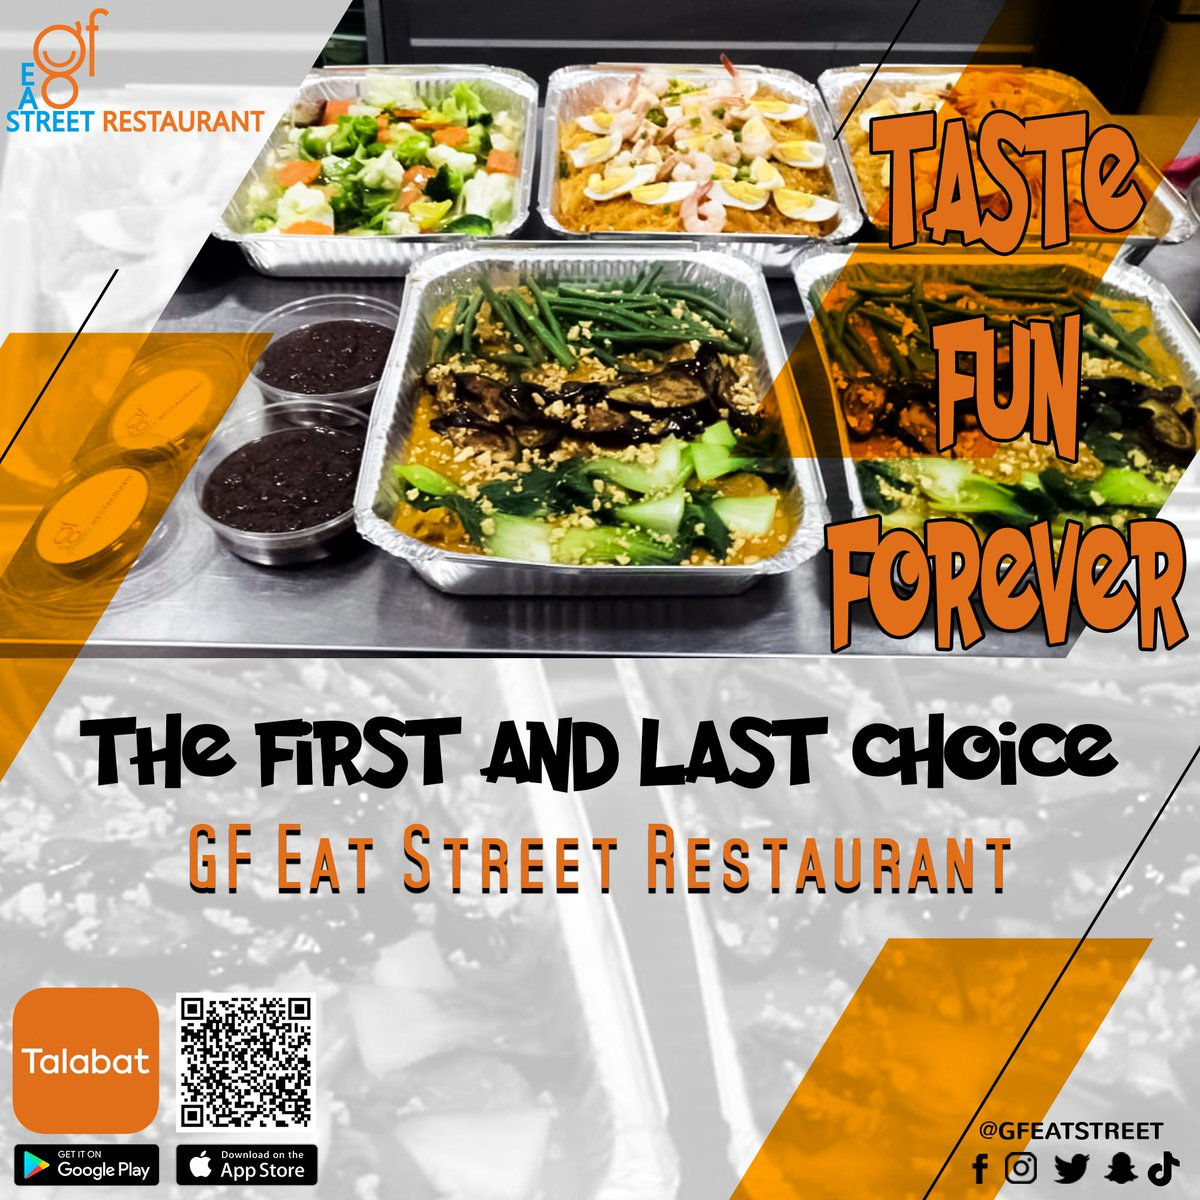 The first and last choice 😎 Gfeatstreet❤️ #gfeatstreet #tastyfood #talabat #asianfood #chinese #japanese #thaifood #filipino #tiktok #uae #ajman #rak #dubai🇦🇪 #abudhabi #delivery #sharjah #Talabat #discount #freshandhot #yummy #uaerestaurants #ajmanrestaurants #ajmanfood #alain